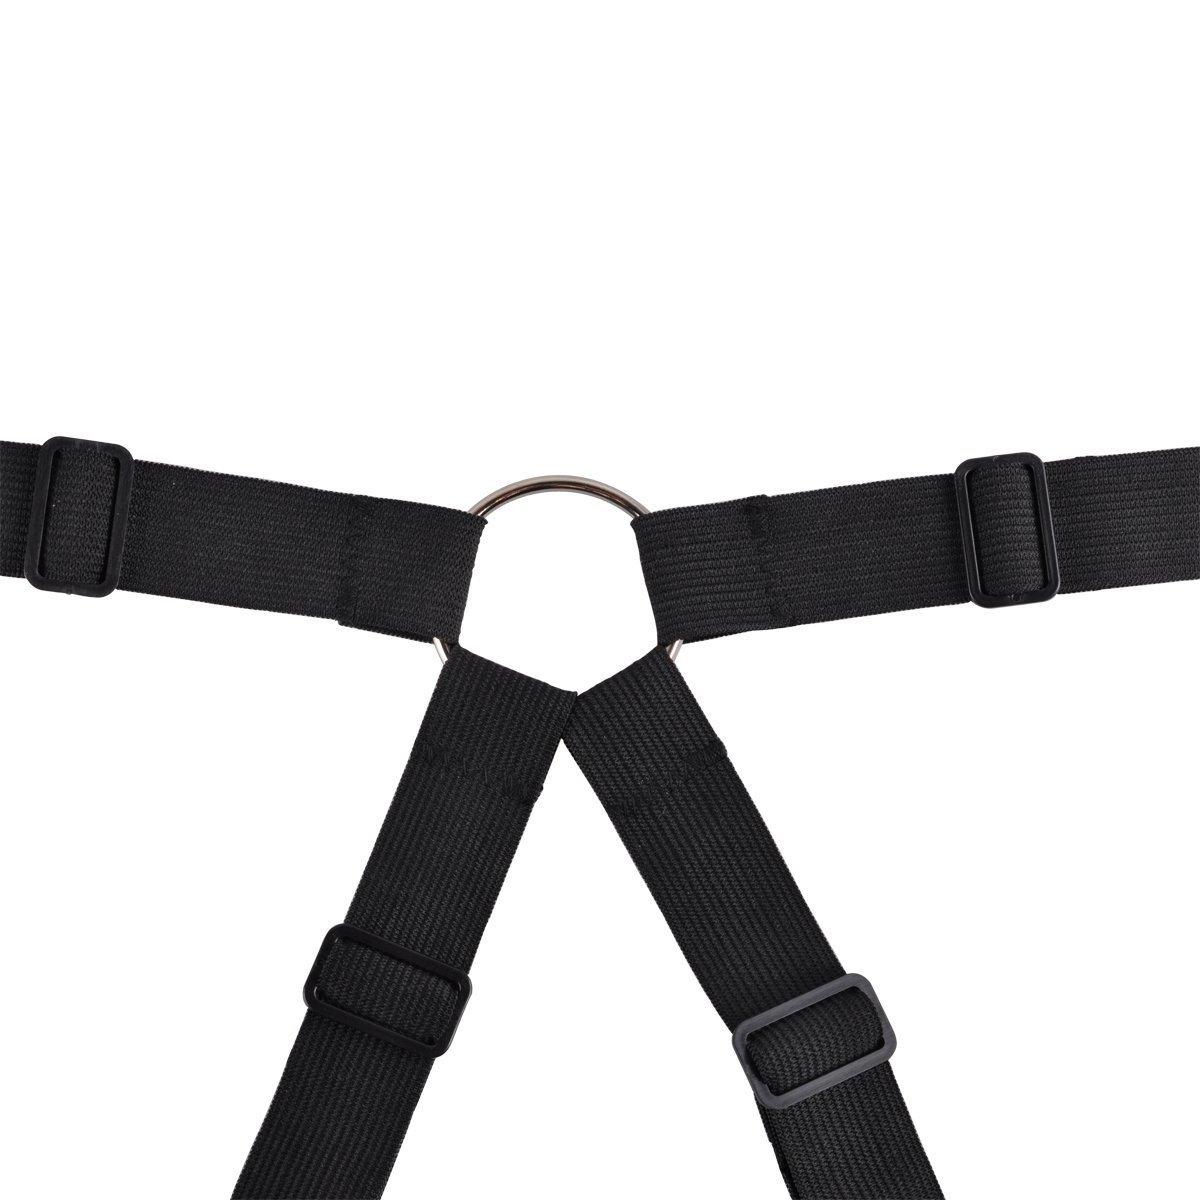 Triangle Sheet Straps Bed Sheet Holder Straps Mattress Sheet Suspenders Adjustable Bed Sheet Fasteners Suspenders, 1 Pack Black by Bmstar